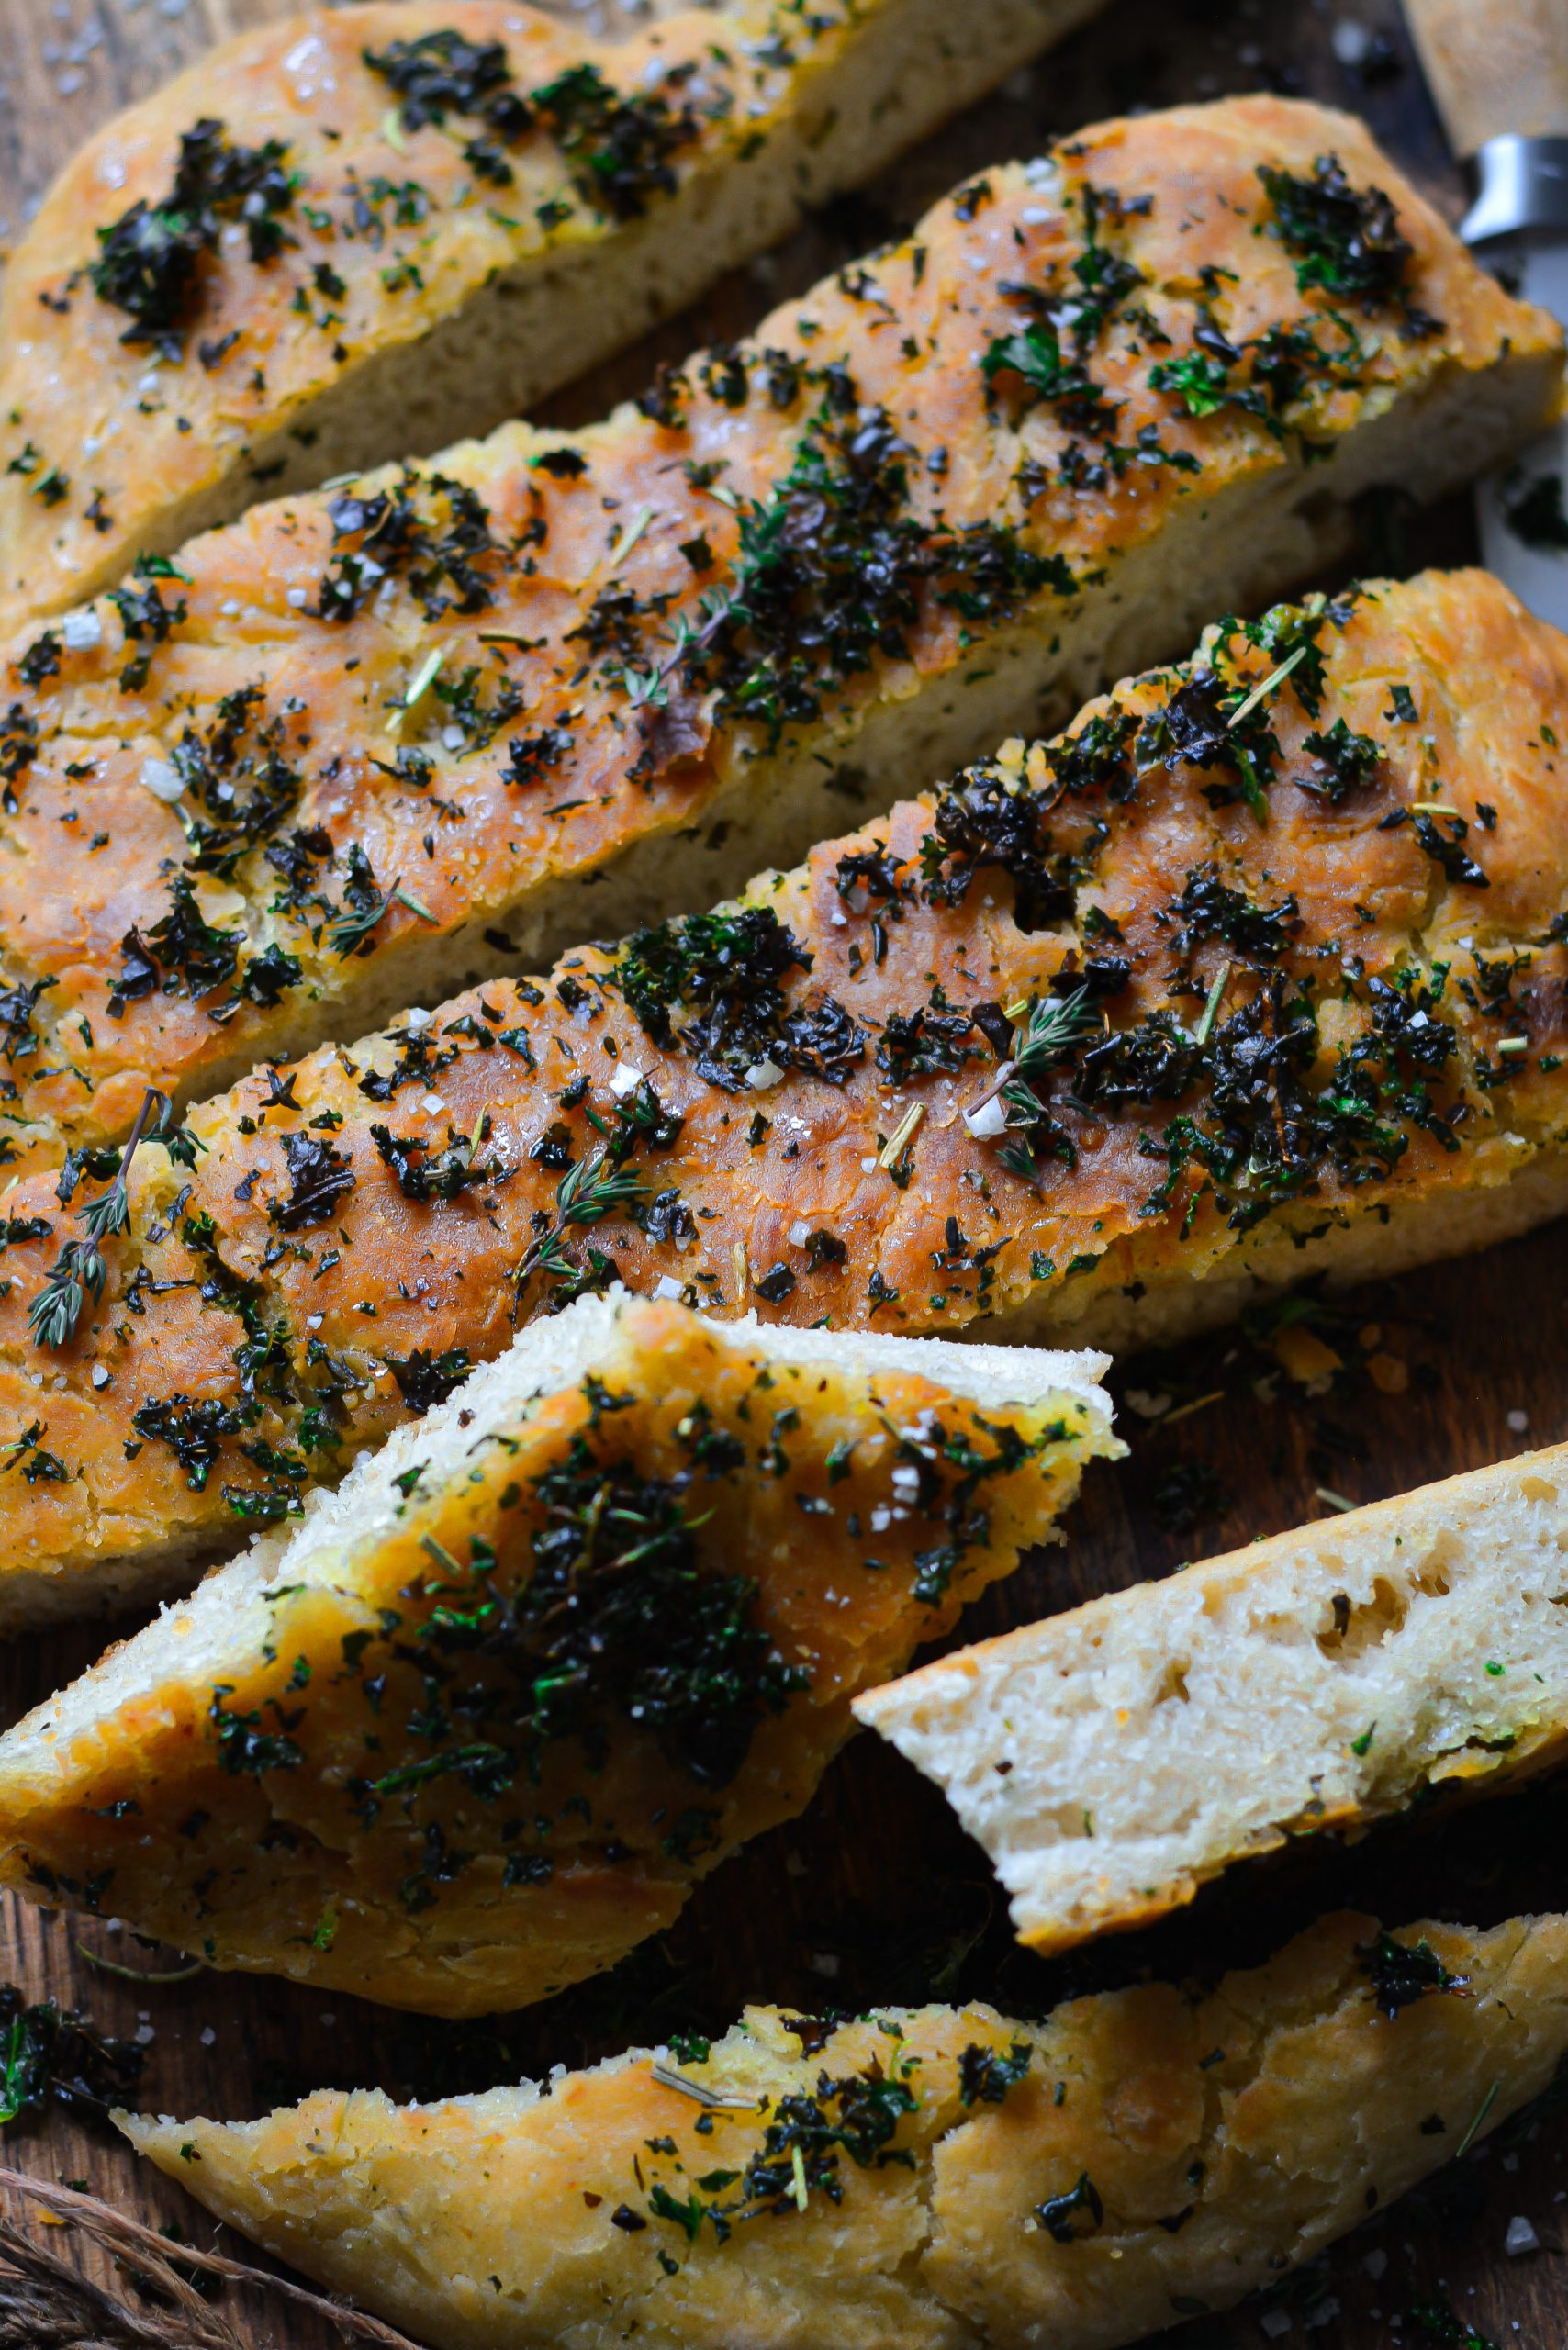 Focaccia Vegan au Pesto de Kale Sans Pétrissage / No-Knead Vegan Kale Pesto Focaccia